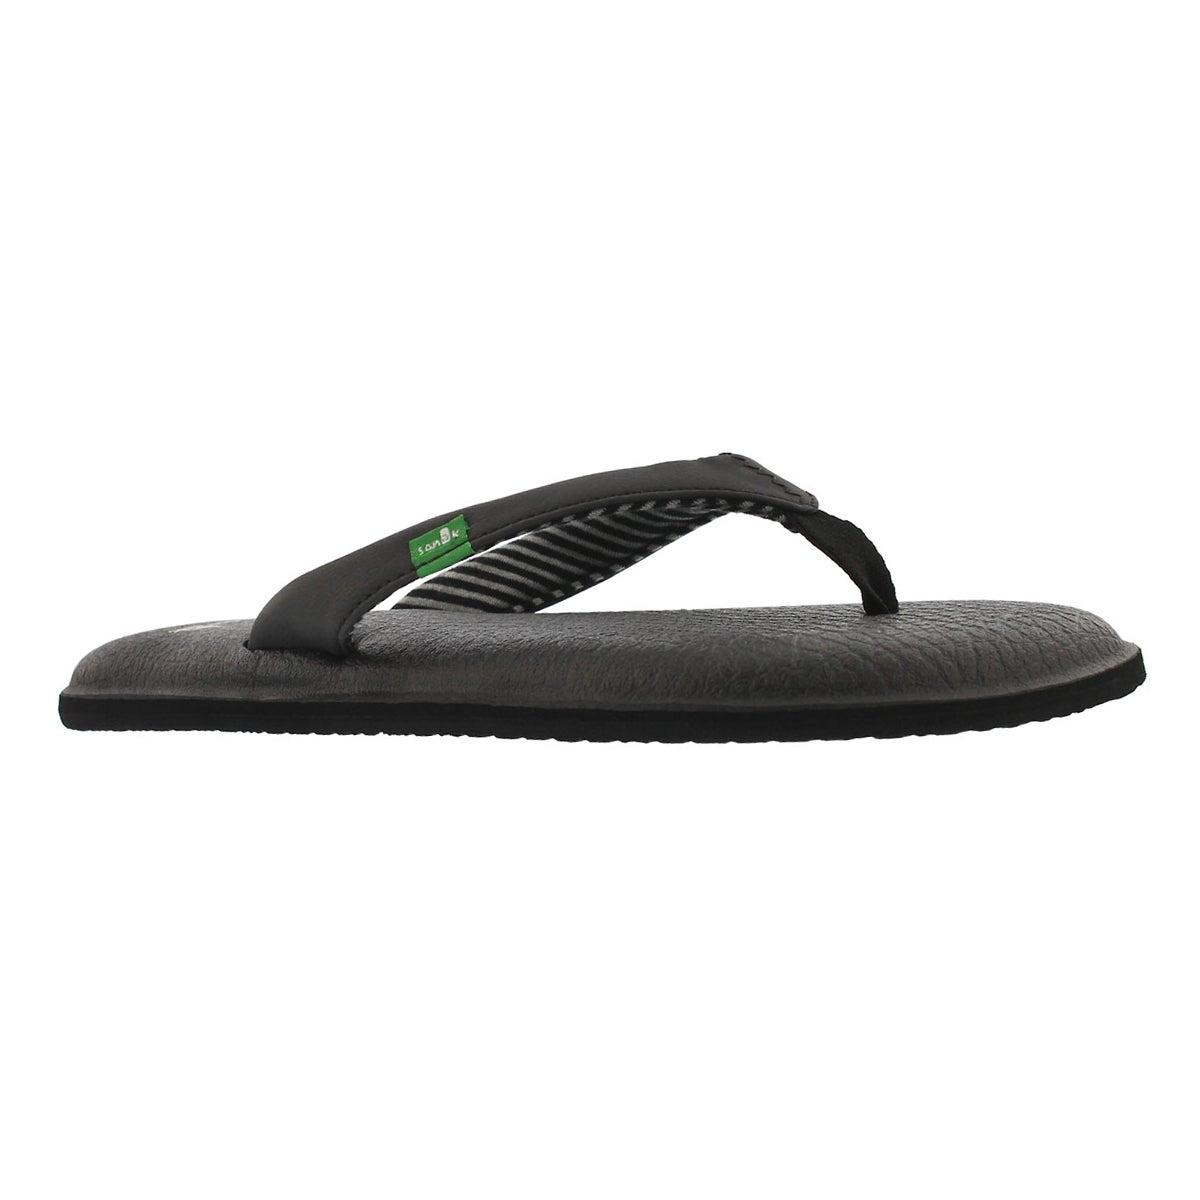 45919c020c6da8 Sanuk Women s YOGA CHAKRA black flip flops